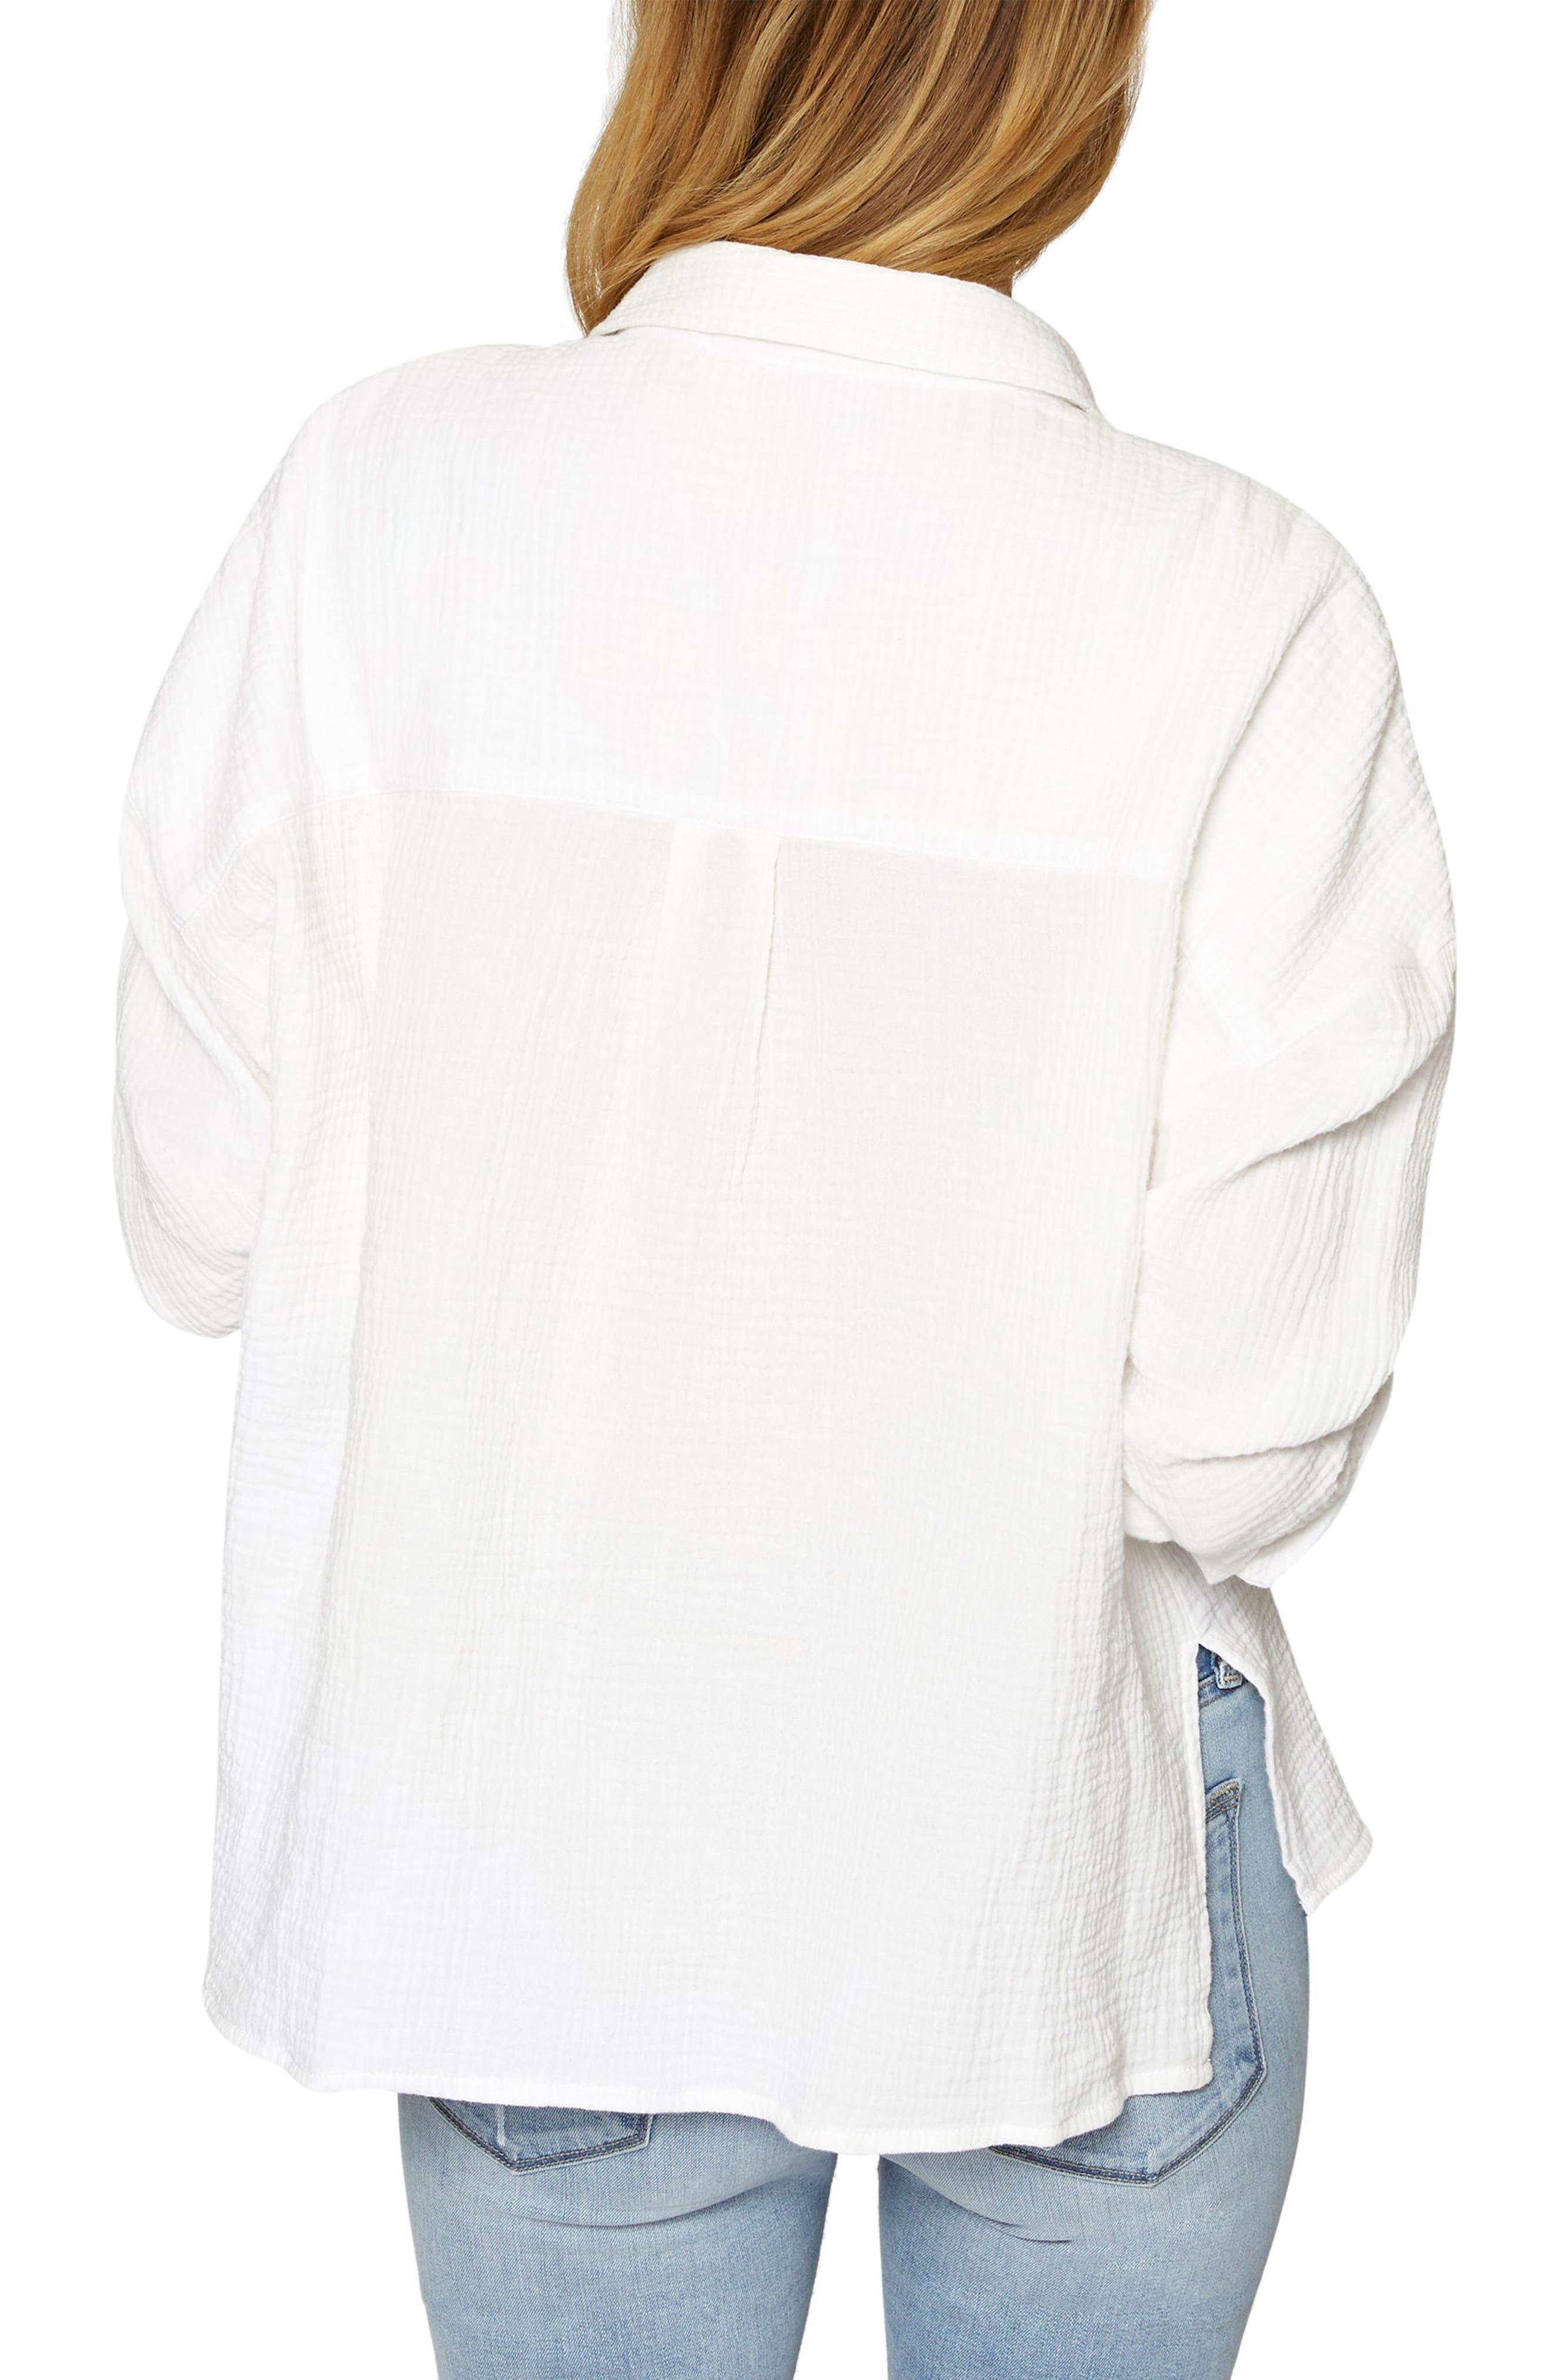 Mod Boyfriend Shirt,                             Alternate thumbnail 2, color,                             White